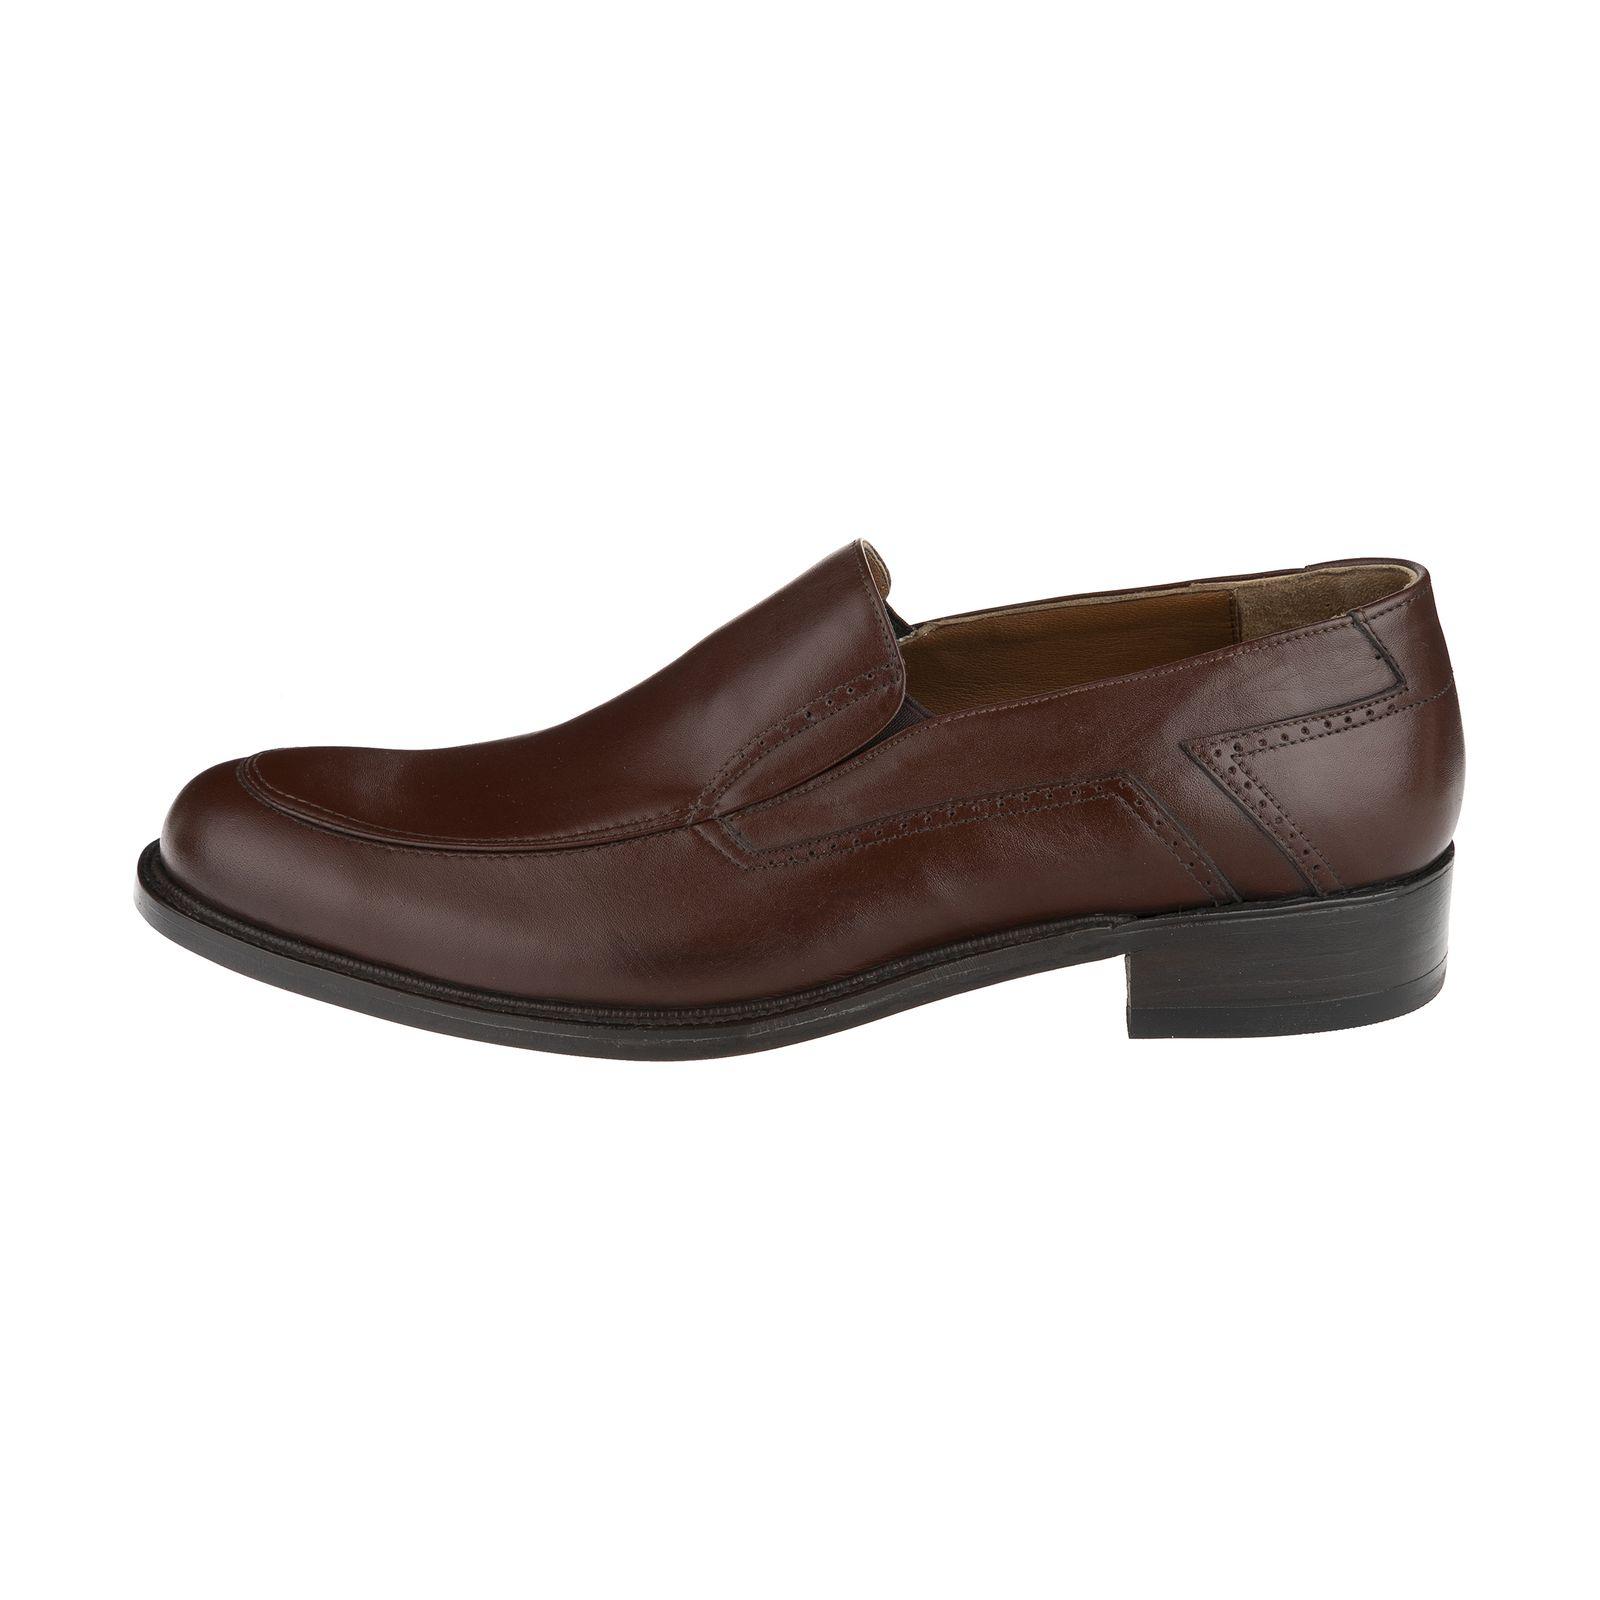 کفش مردانه نظری کد 434 -  - 2